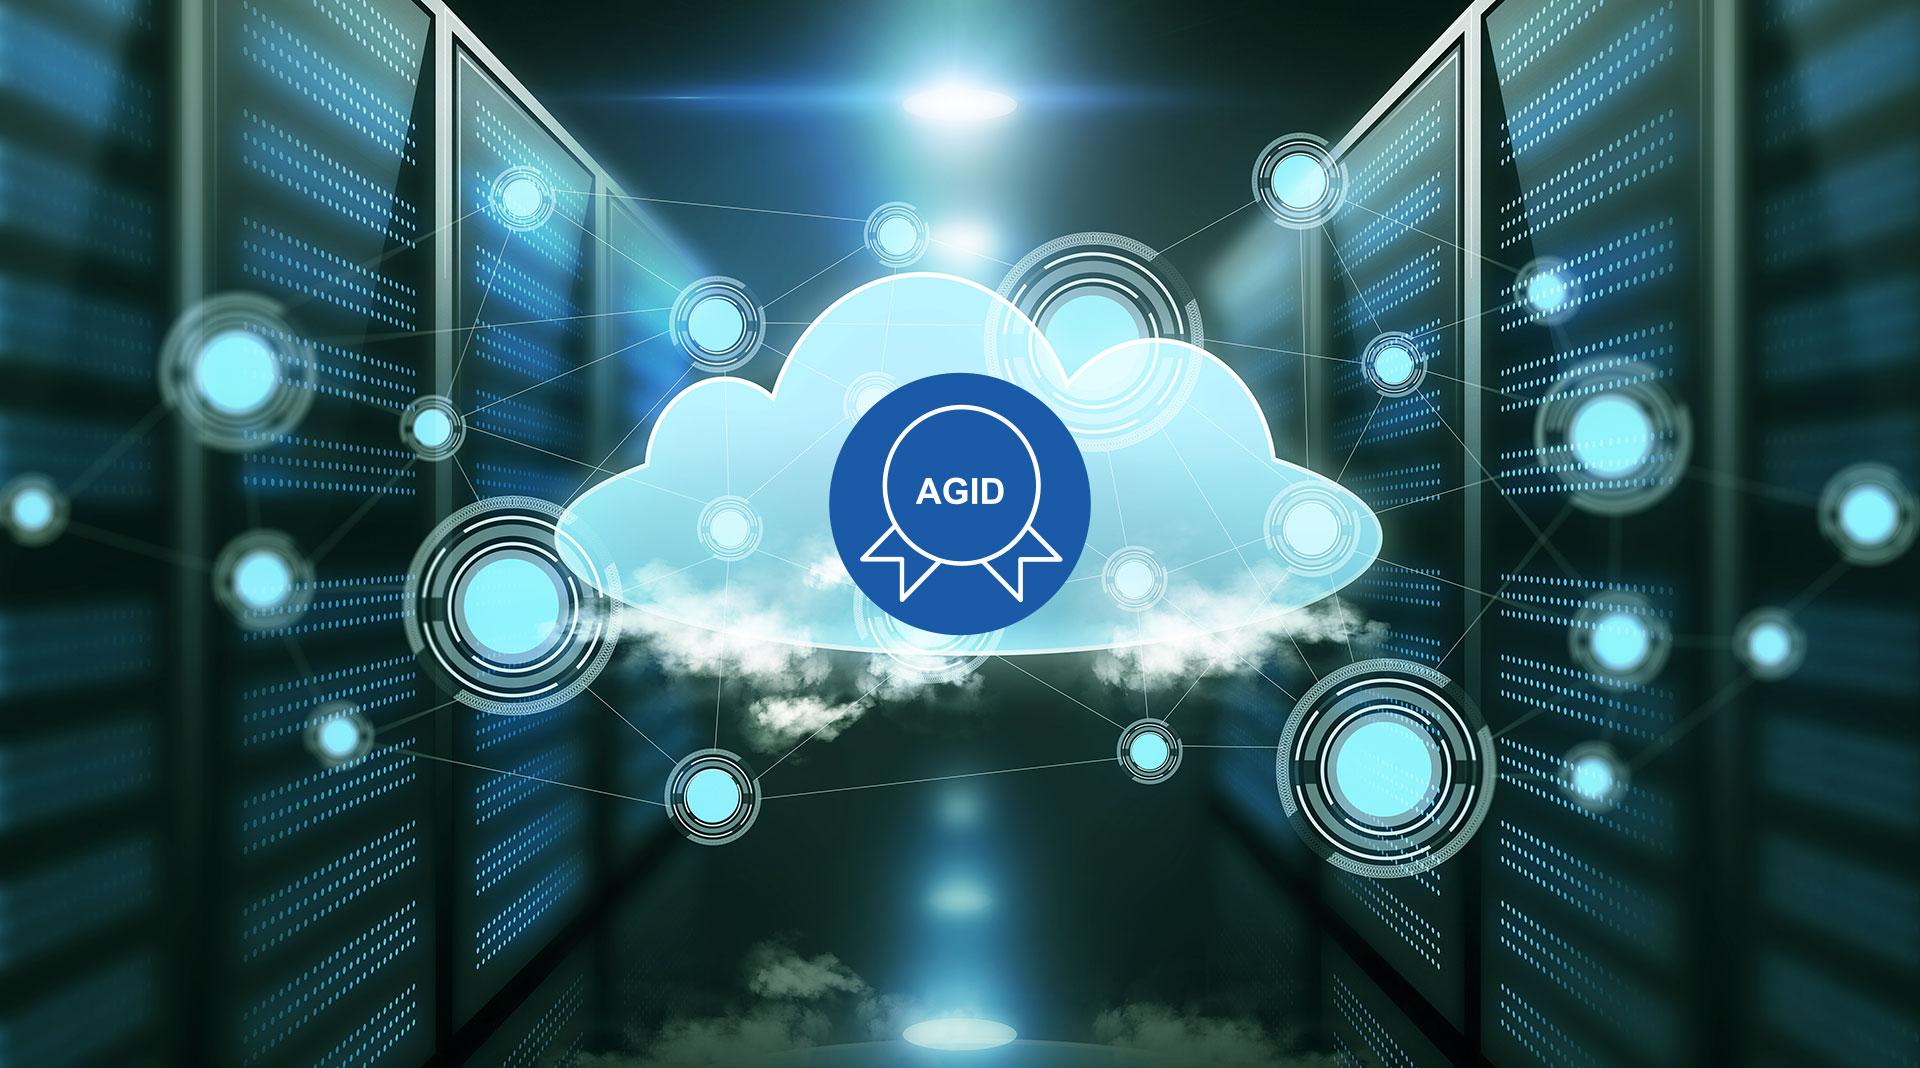 S.Cloud di IRIDEOS nel Cloud Marketplace di AgID